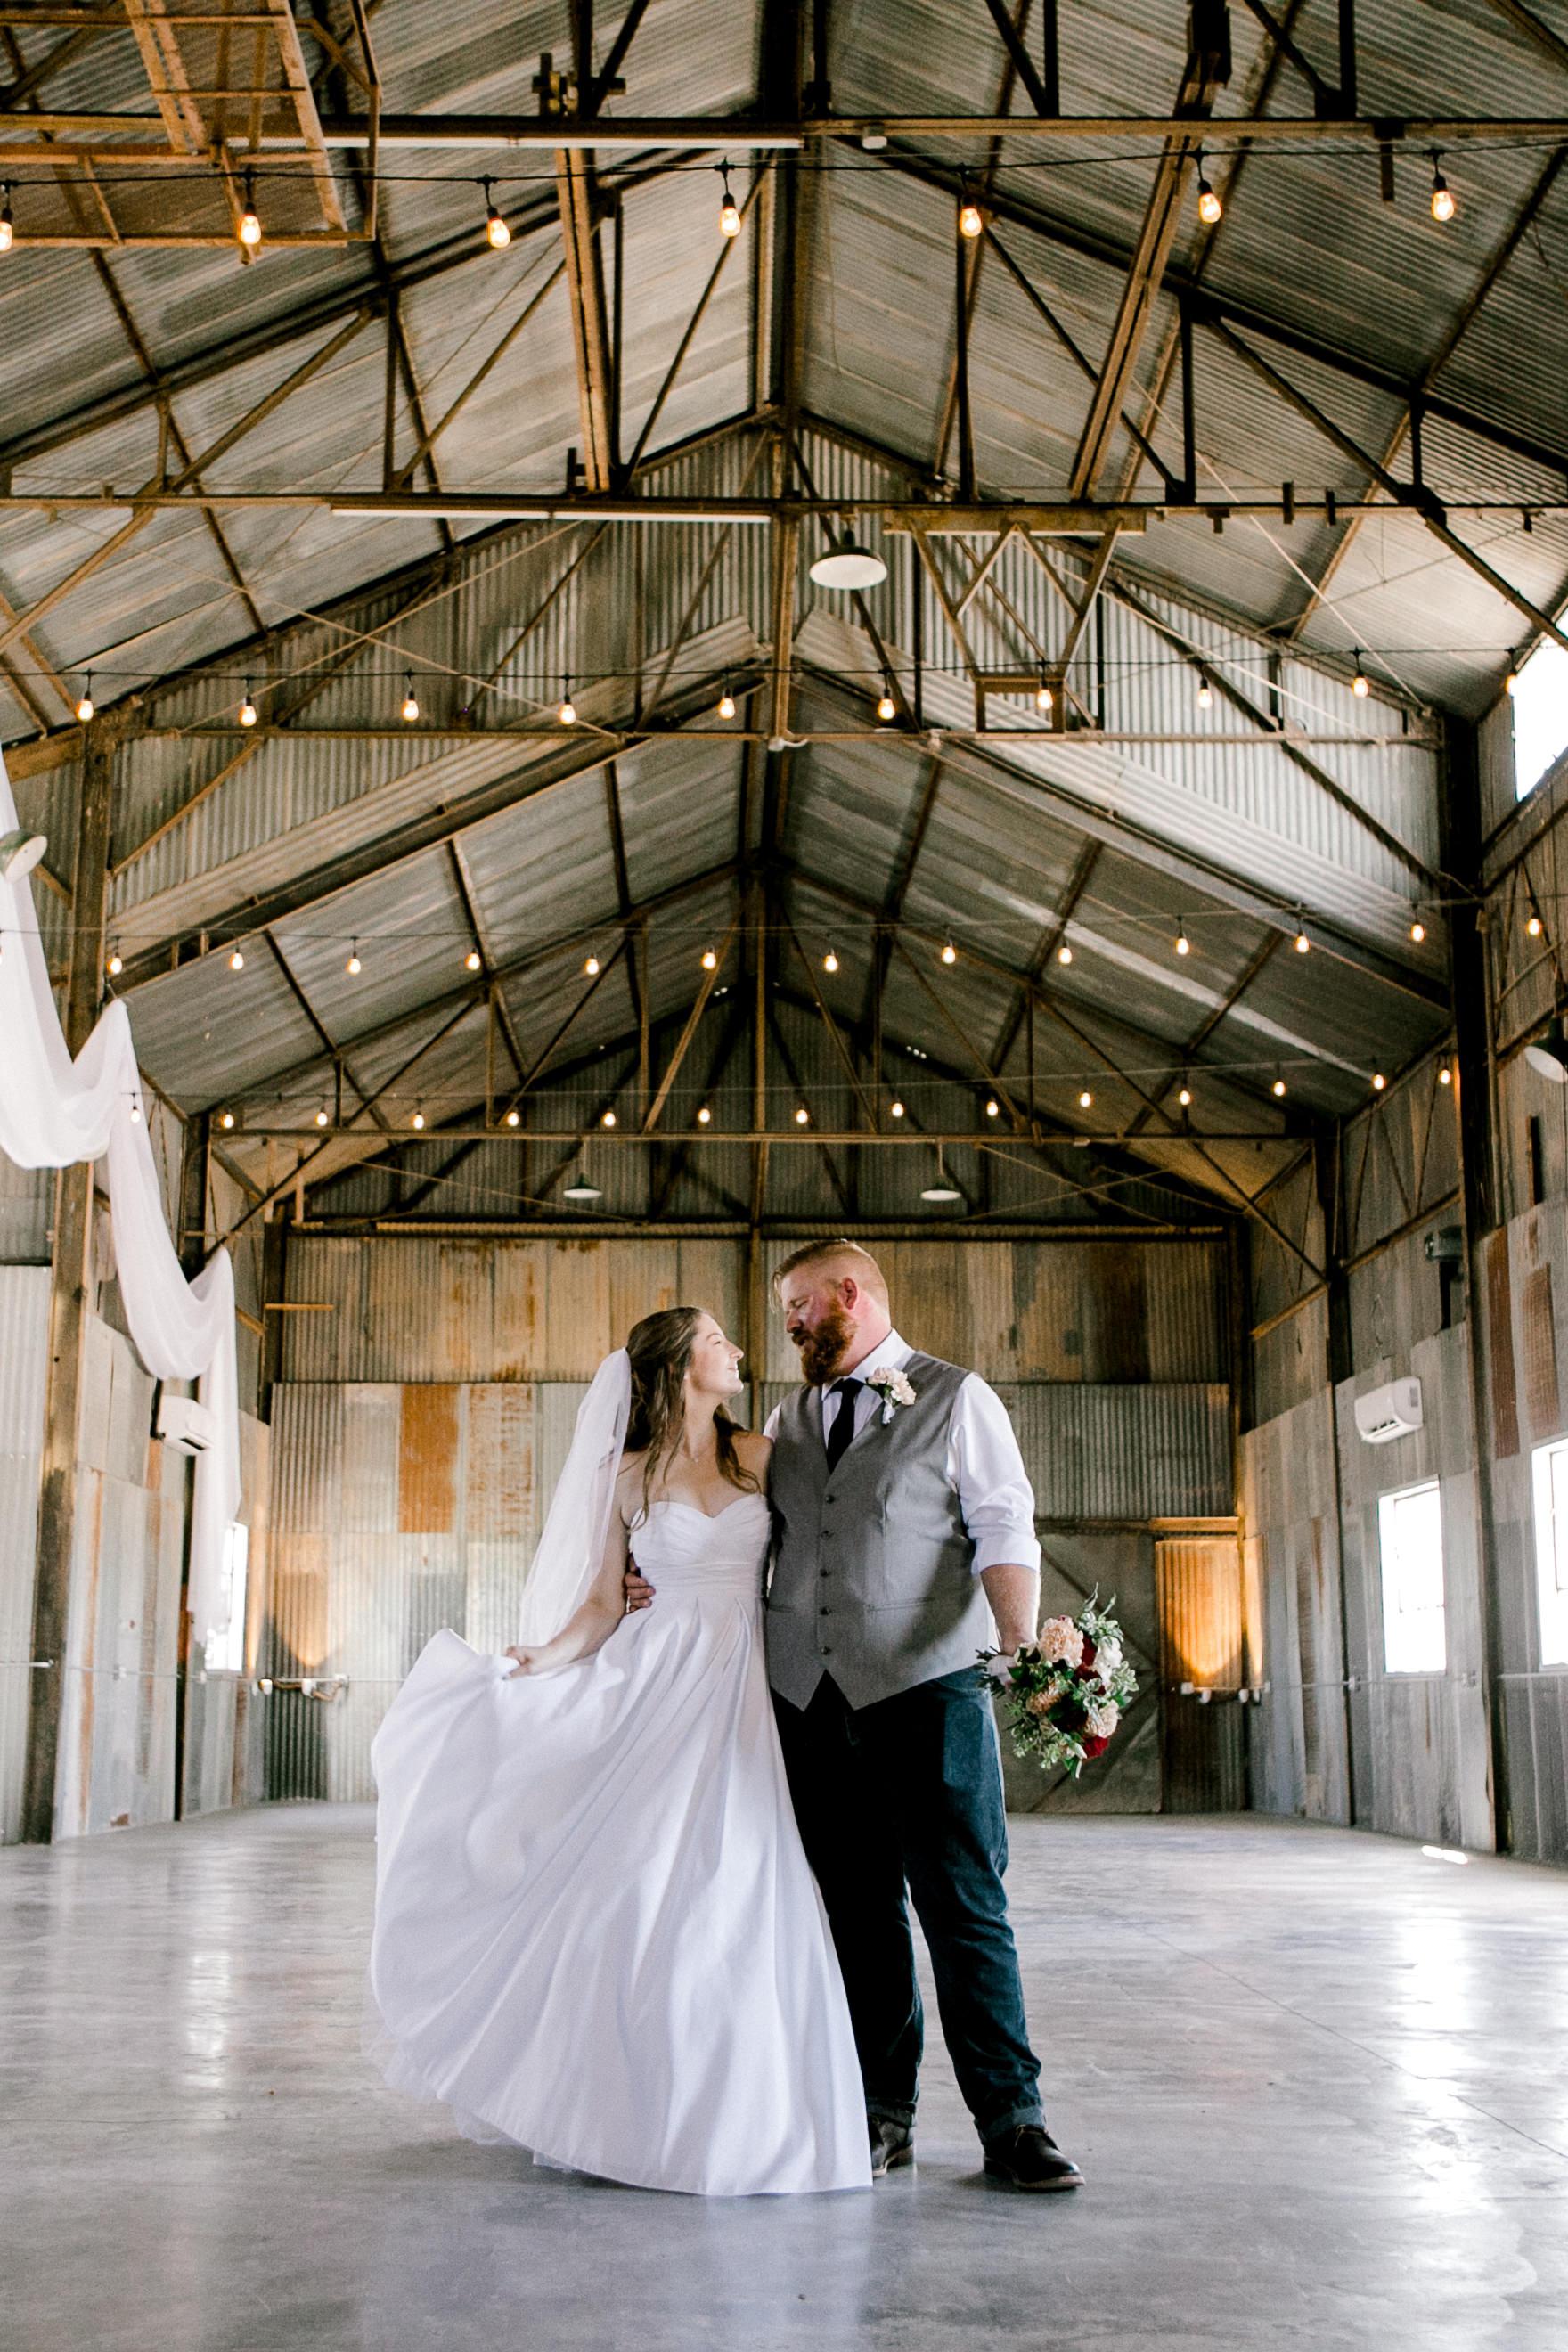 Alex-and-Lukas-Wedding-by-Emily-Nicole-Photo-40.jpg